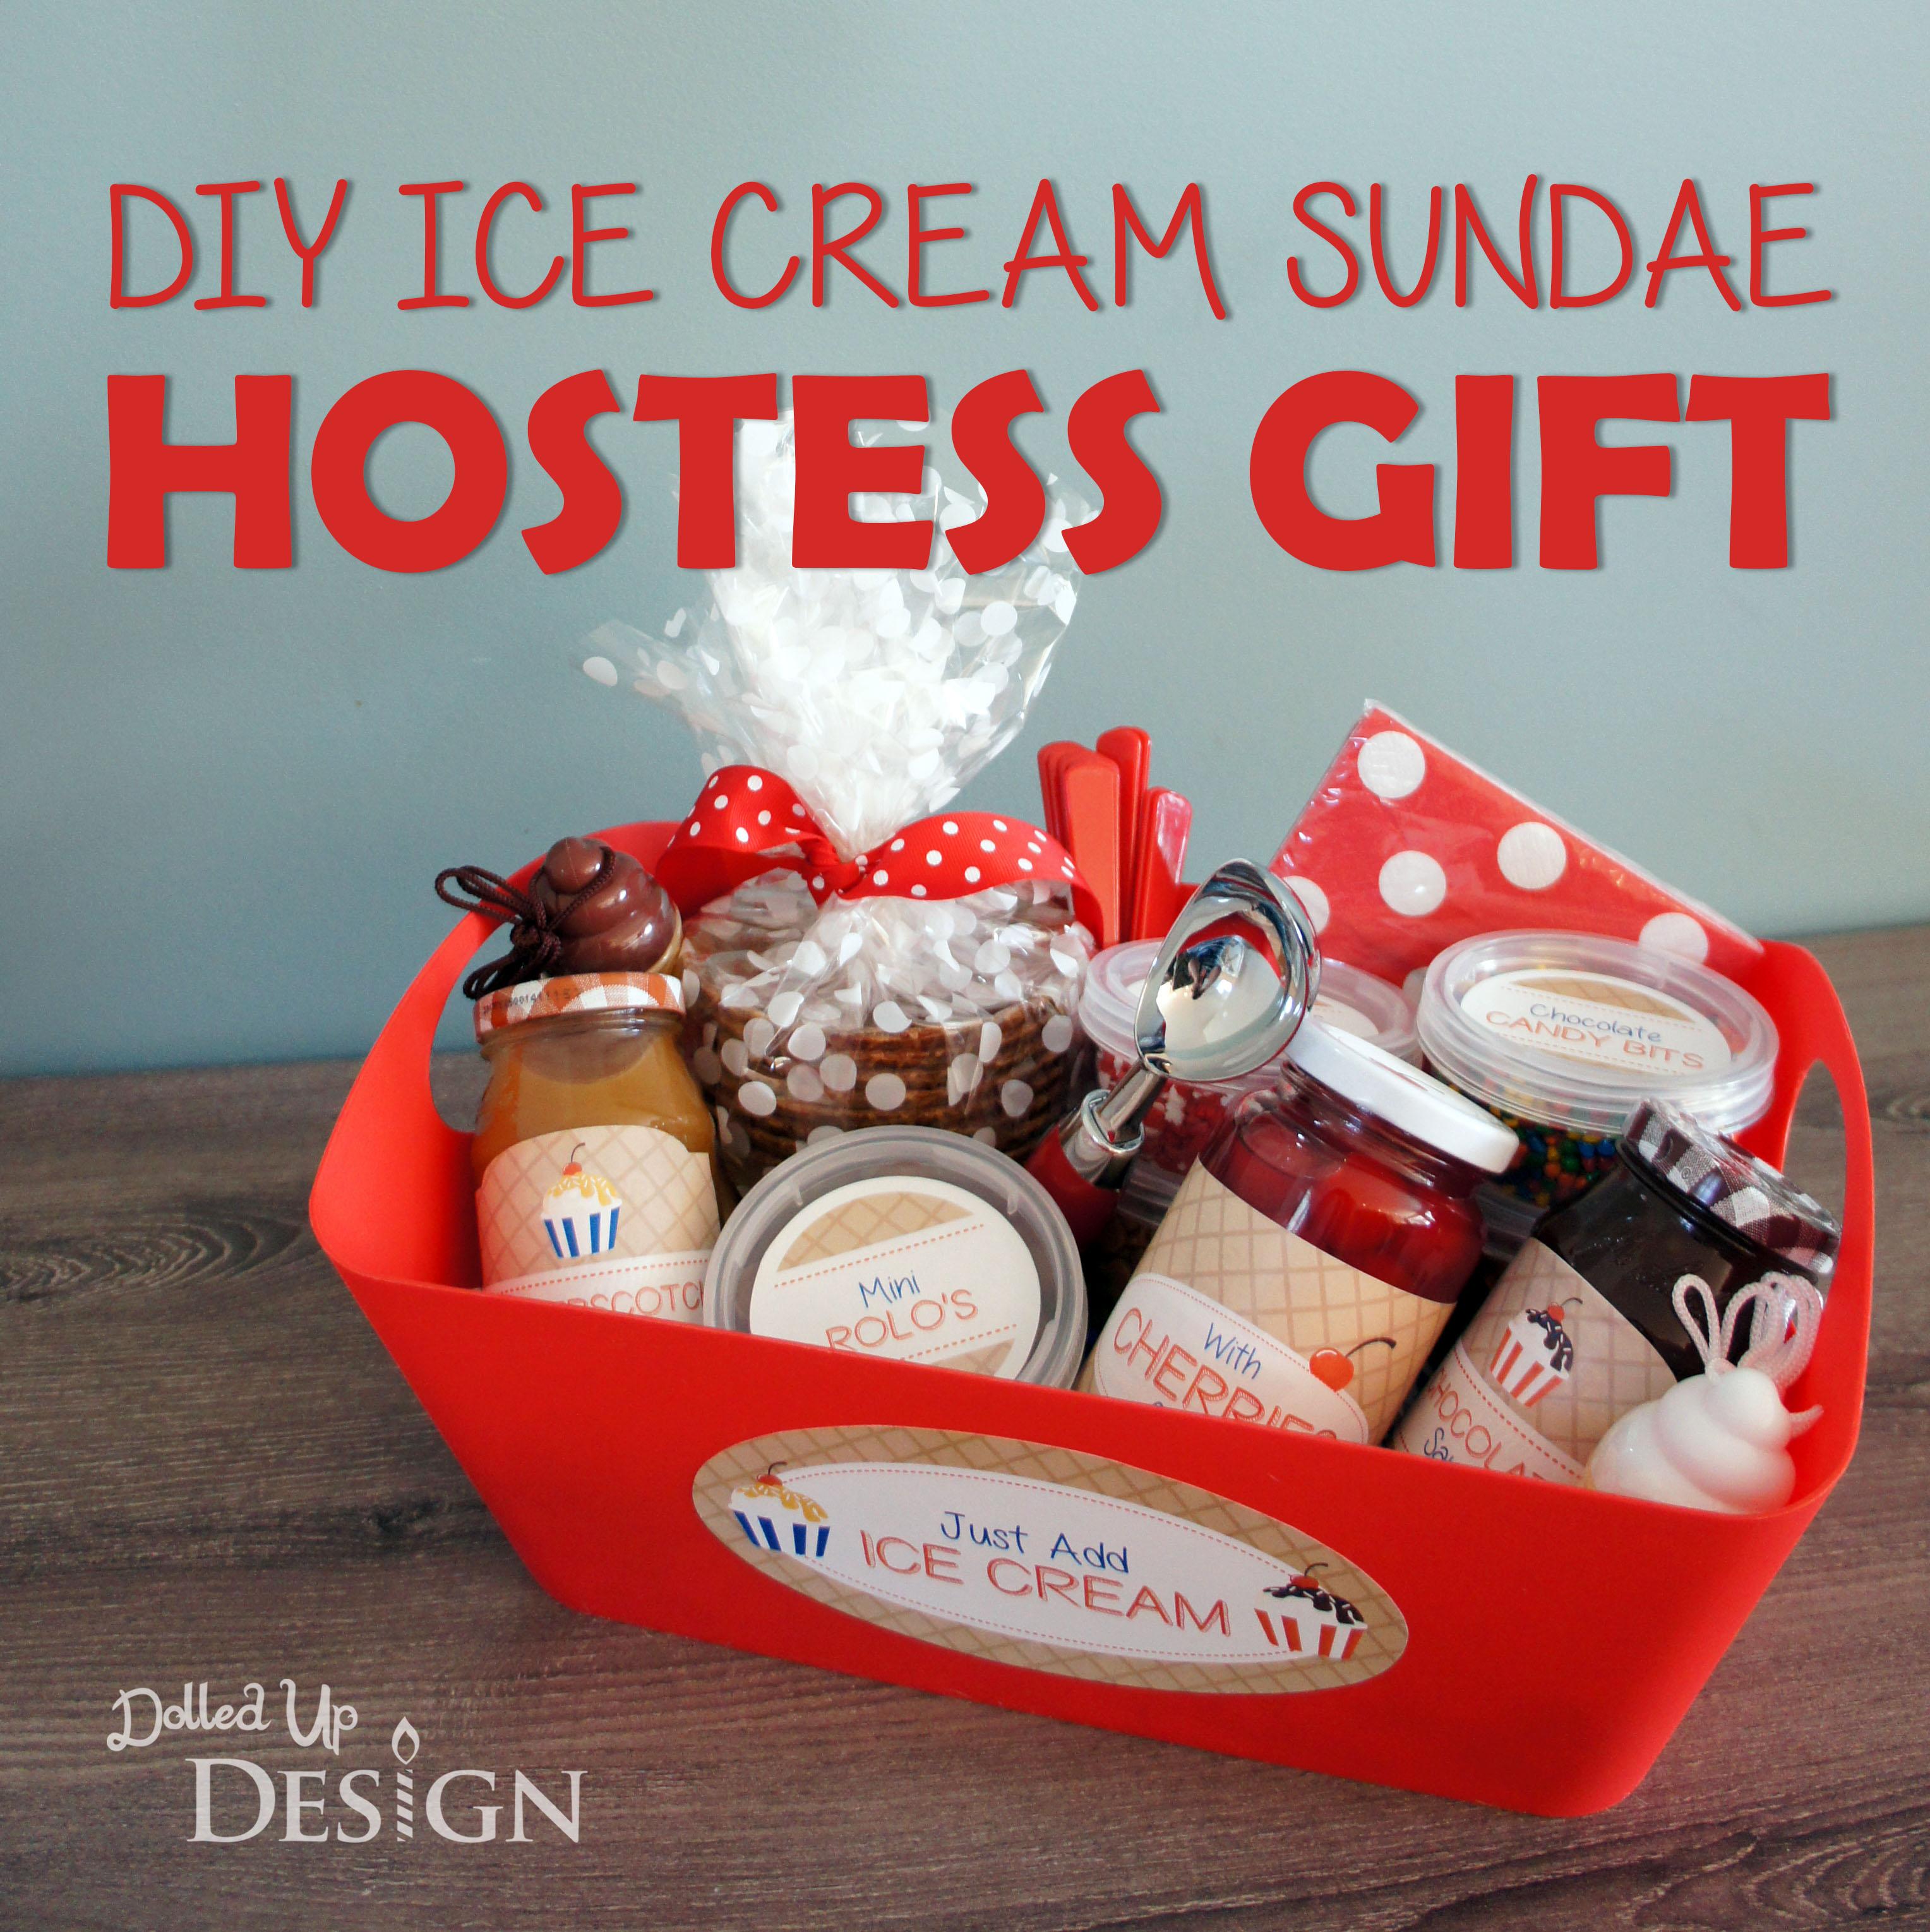 DIY Ice Cream Sundae Hostess Gift